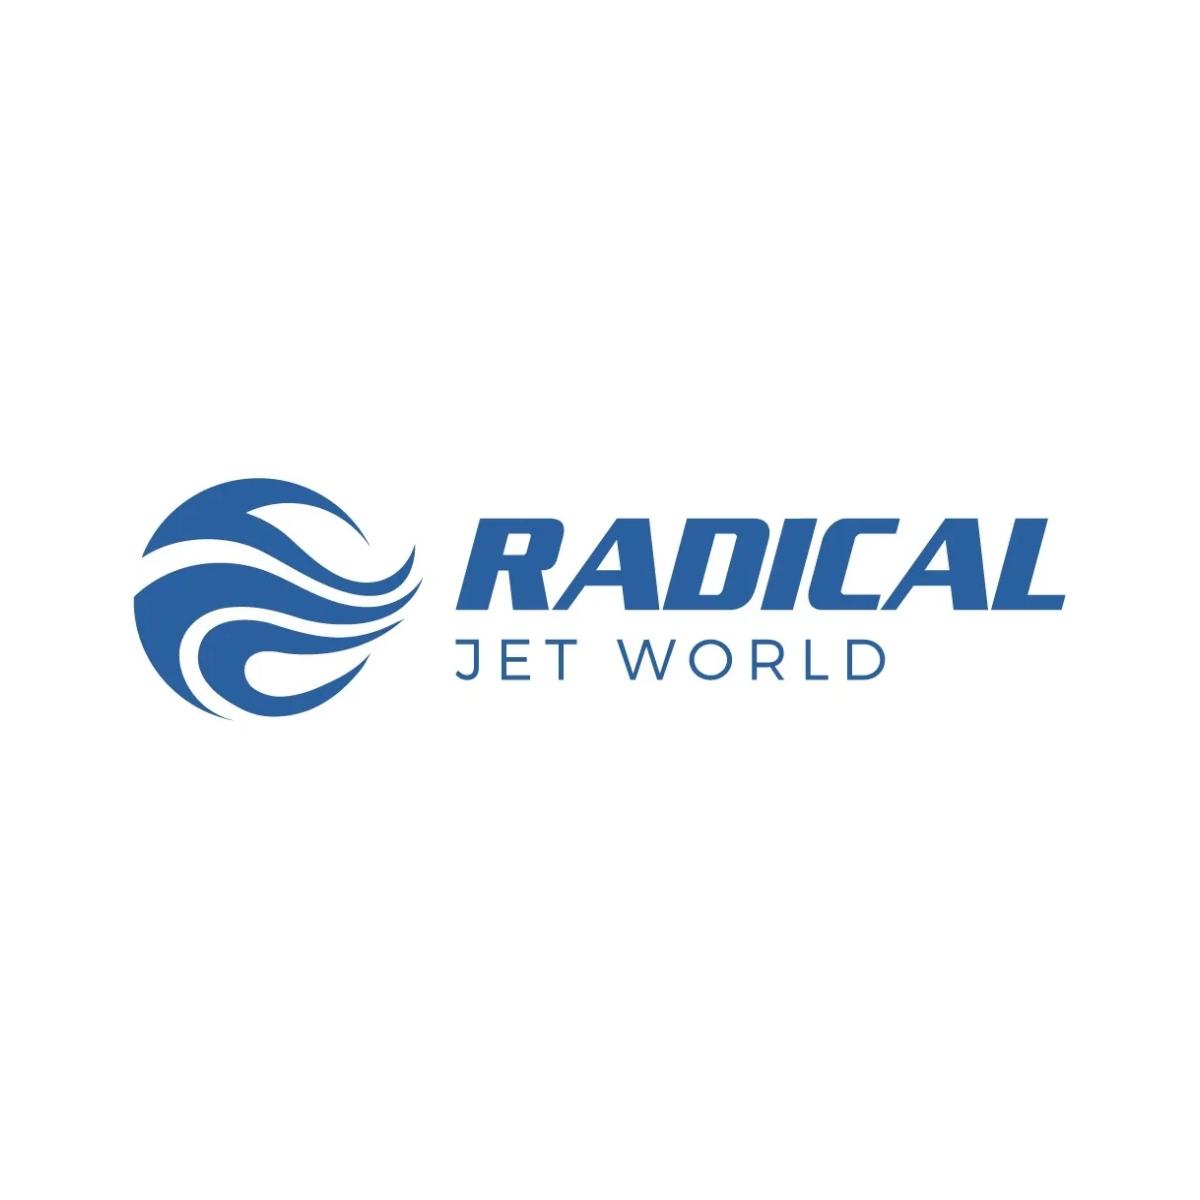 Âncora Bruce aço Inox - 2 Kg  - Radical Peças - Peças para Jet Ski